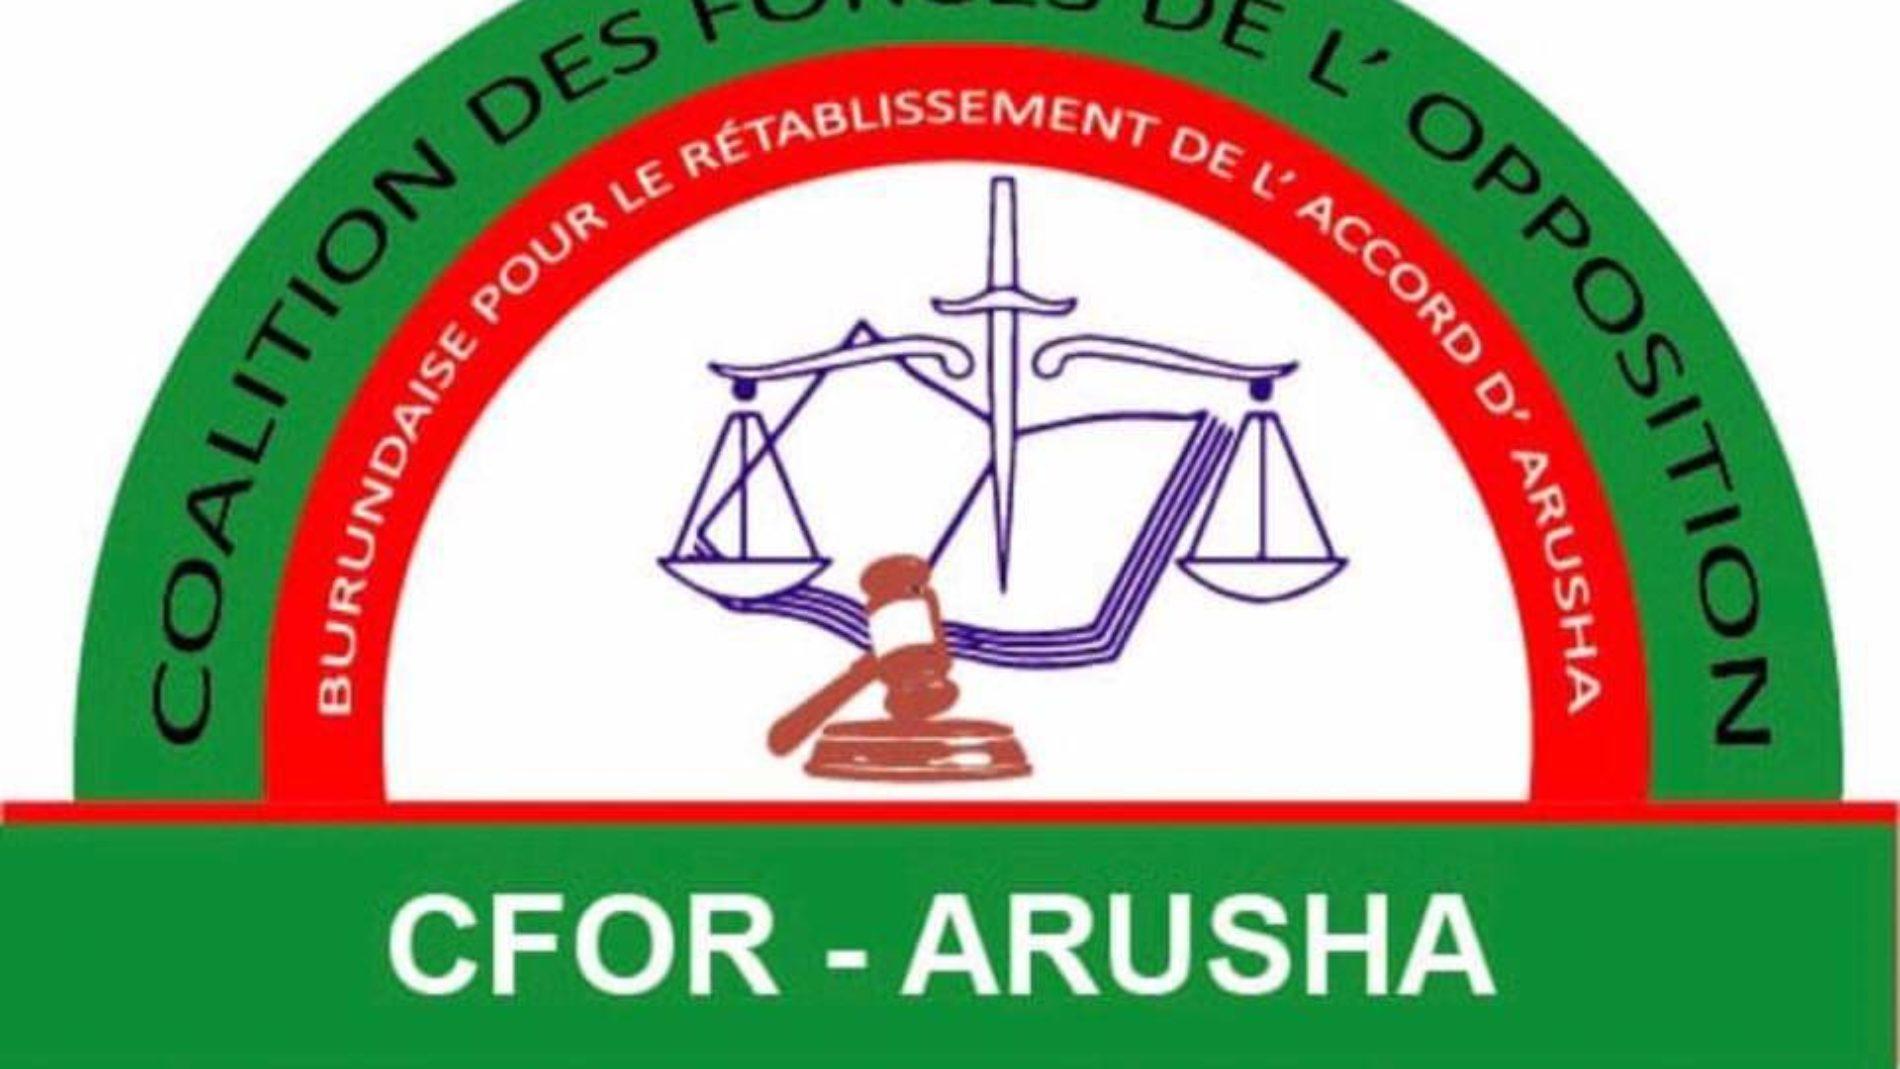 CFOR ARUSHA dénonce la recrudescence des exécutions extra judiciaires au Burundi